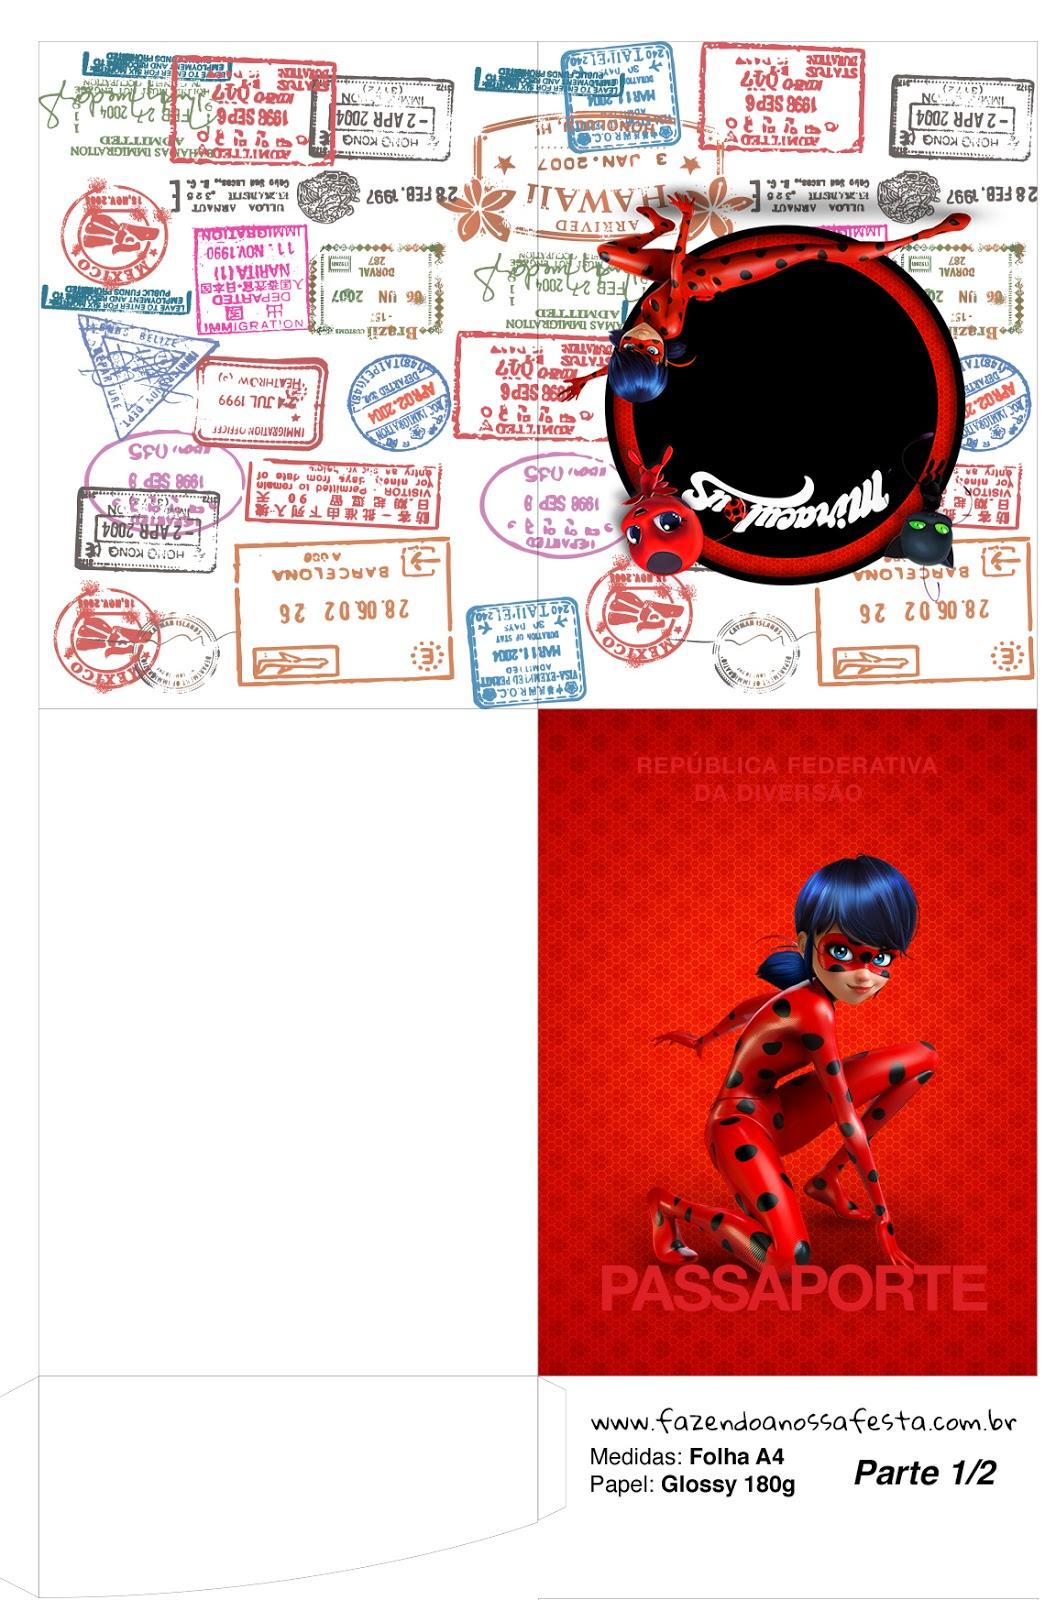 Miraculous Ladybug Free Party Printables